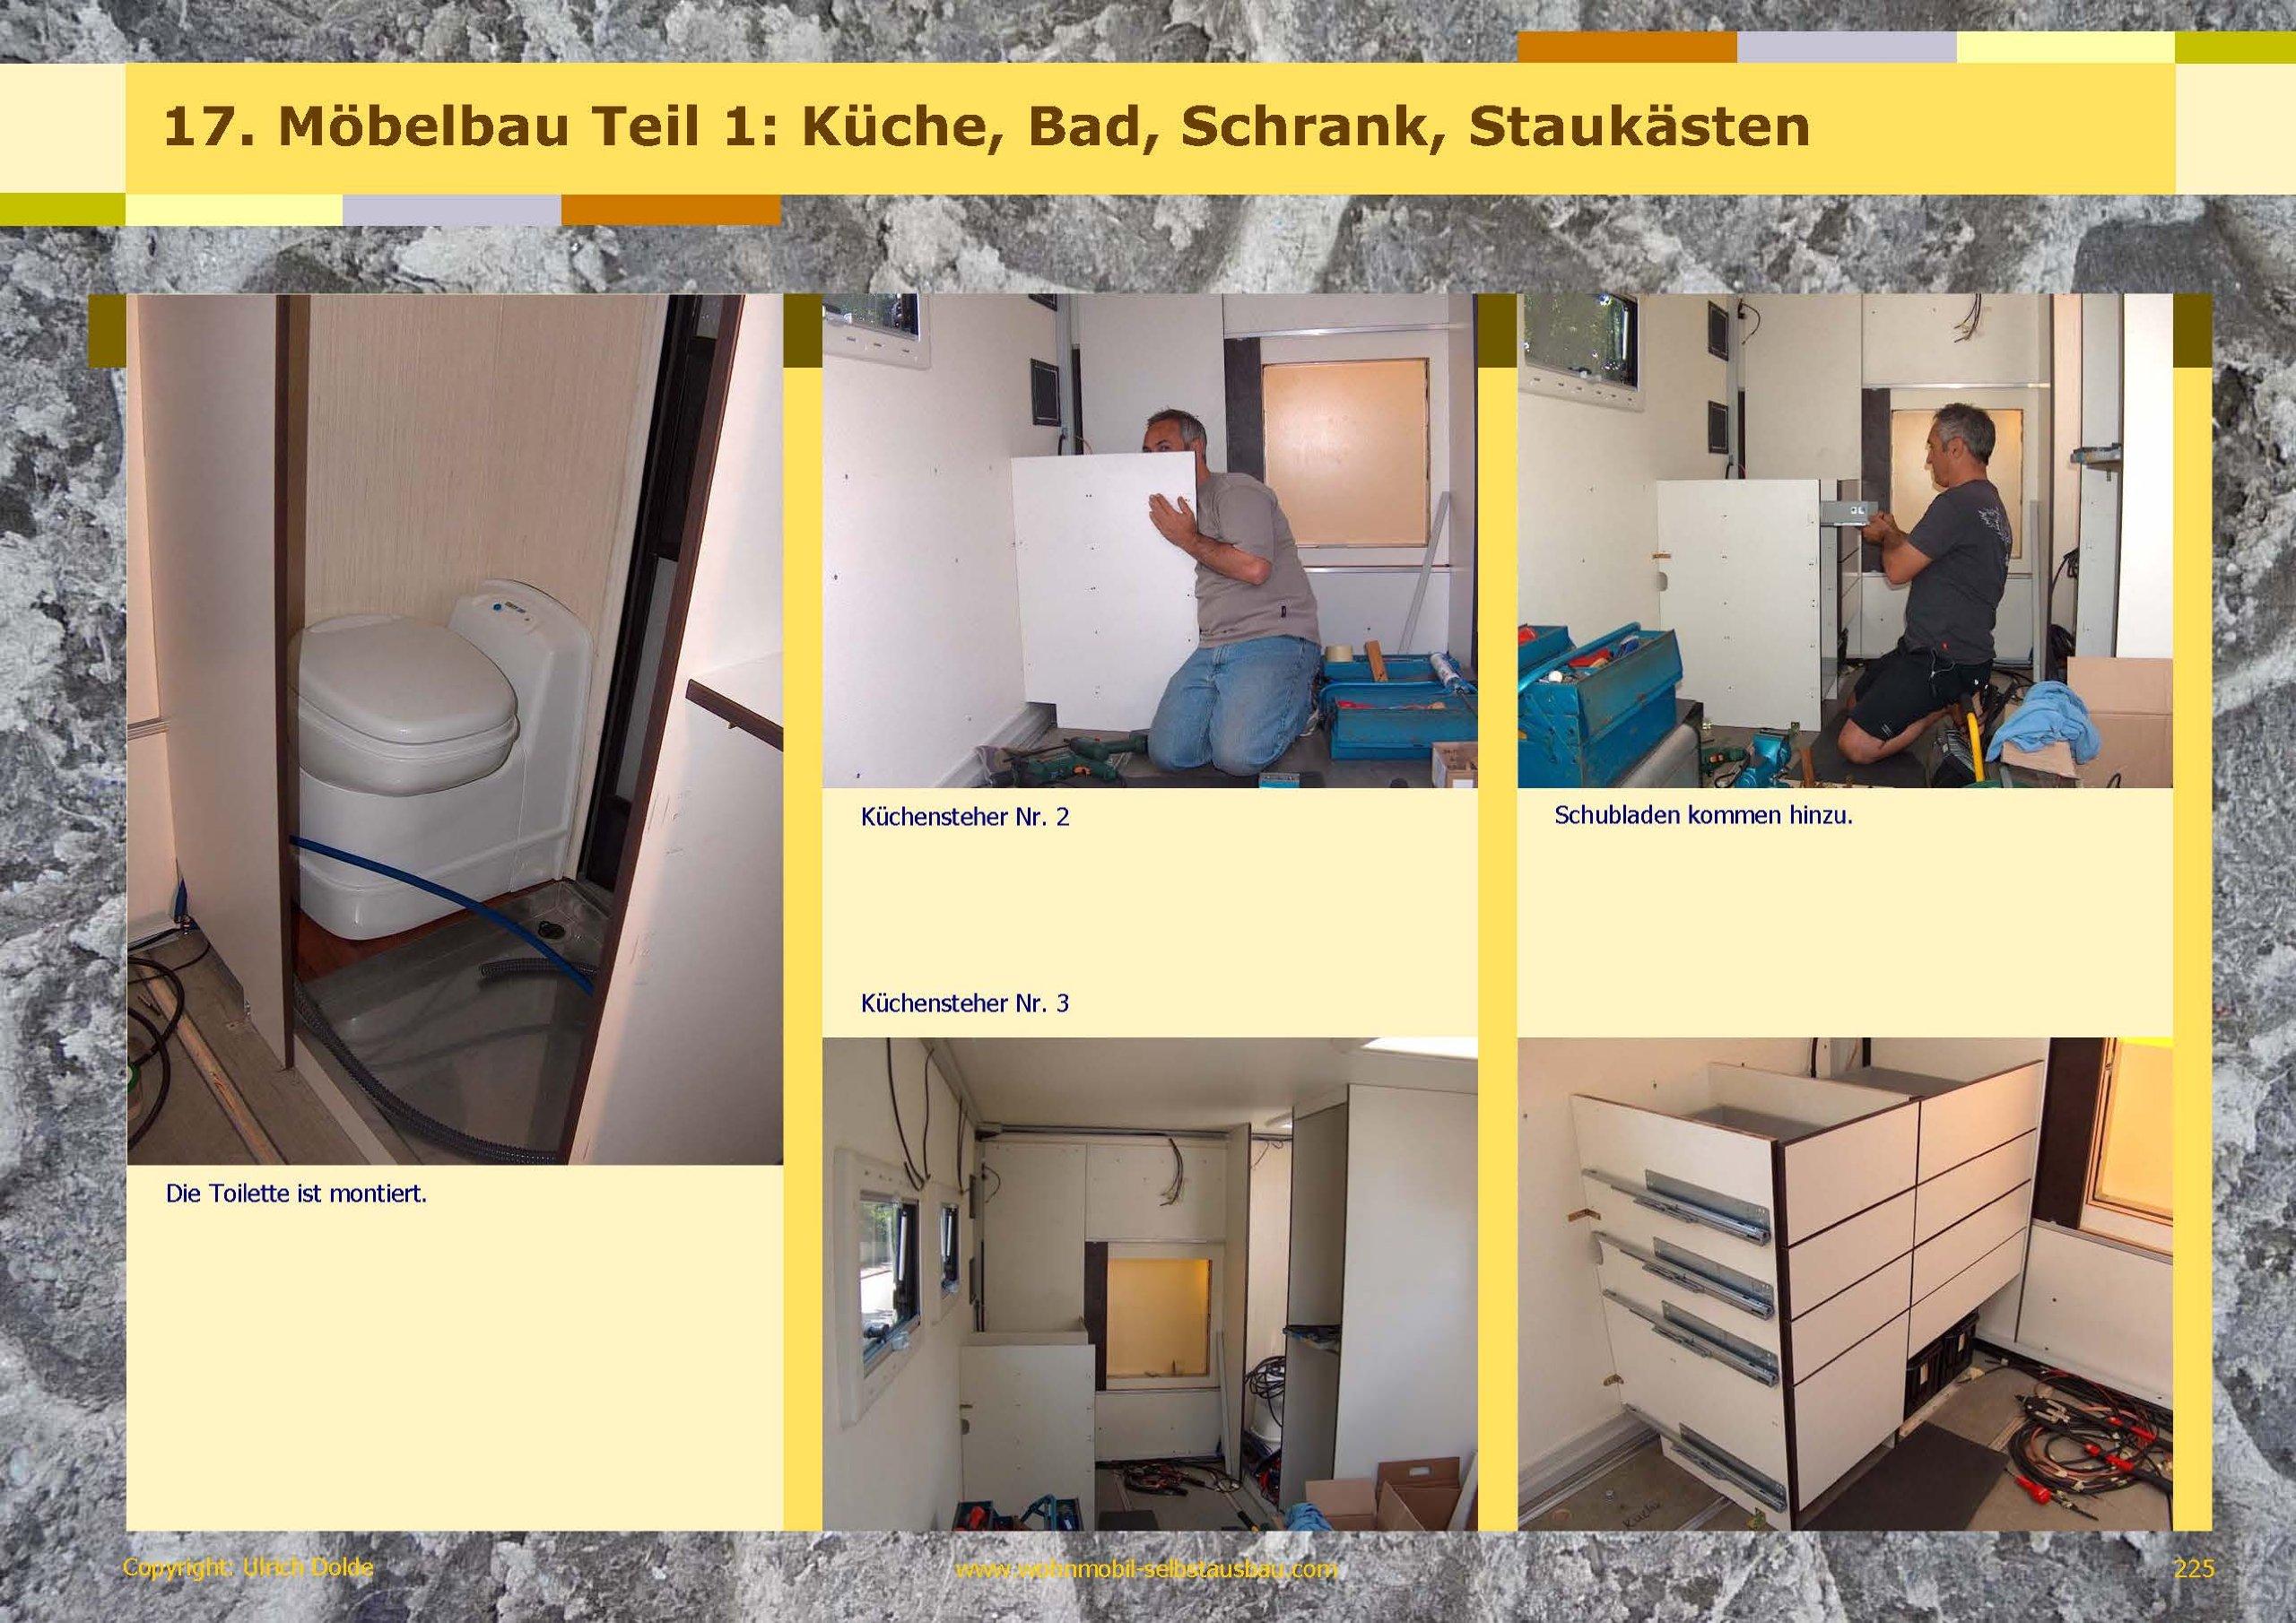 Kuche Ausbauen Lassen Ikea Kuche Programm Aufbauanleitung